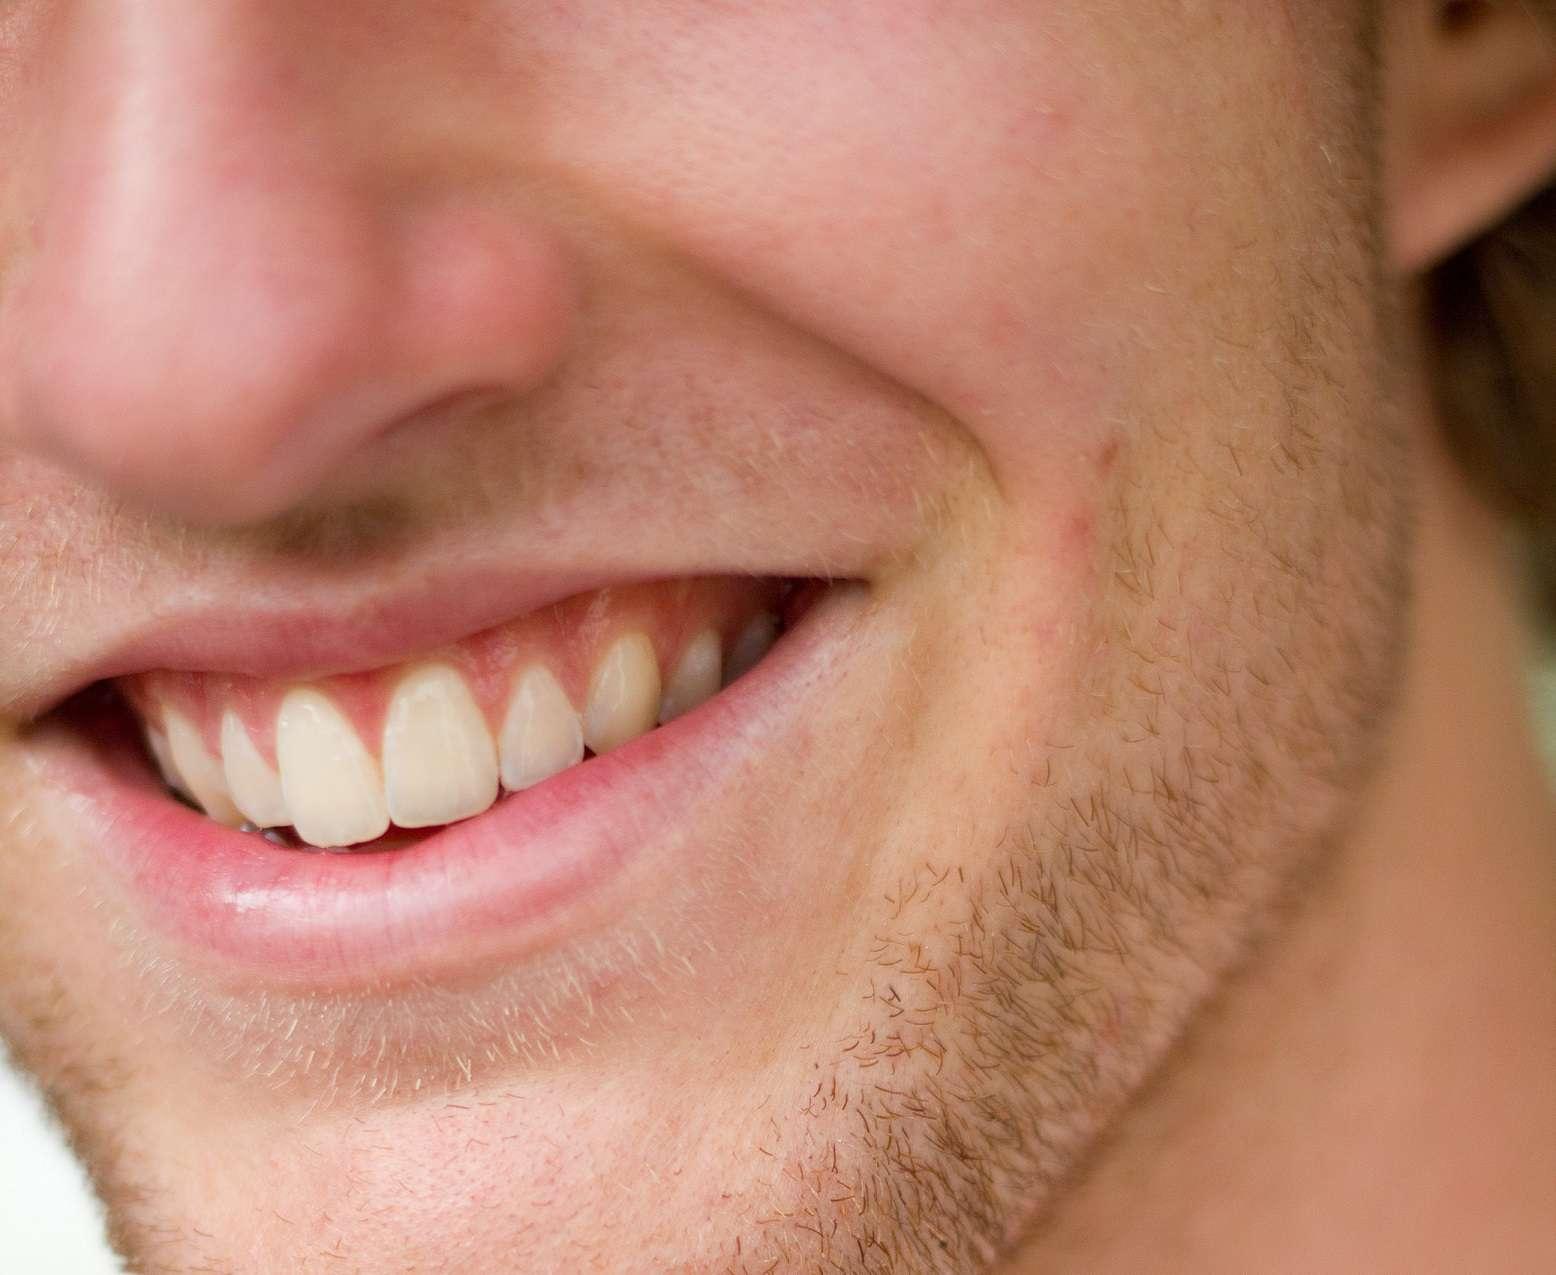 Les muscles zygomatiques se contractent pour sourire. © Tom Newby, Flickr, CC by 2.0